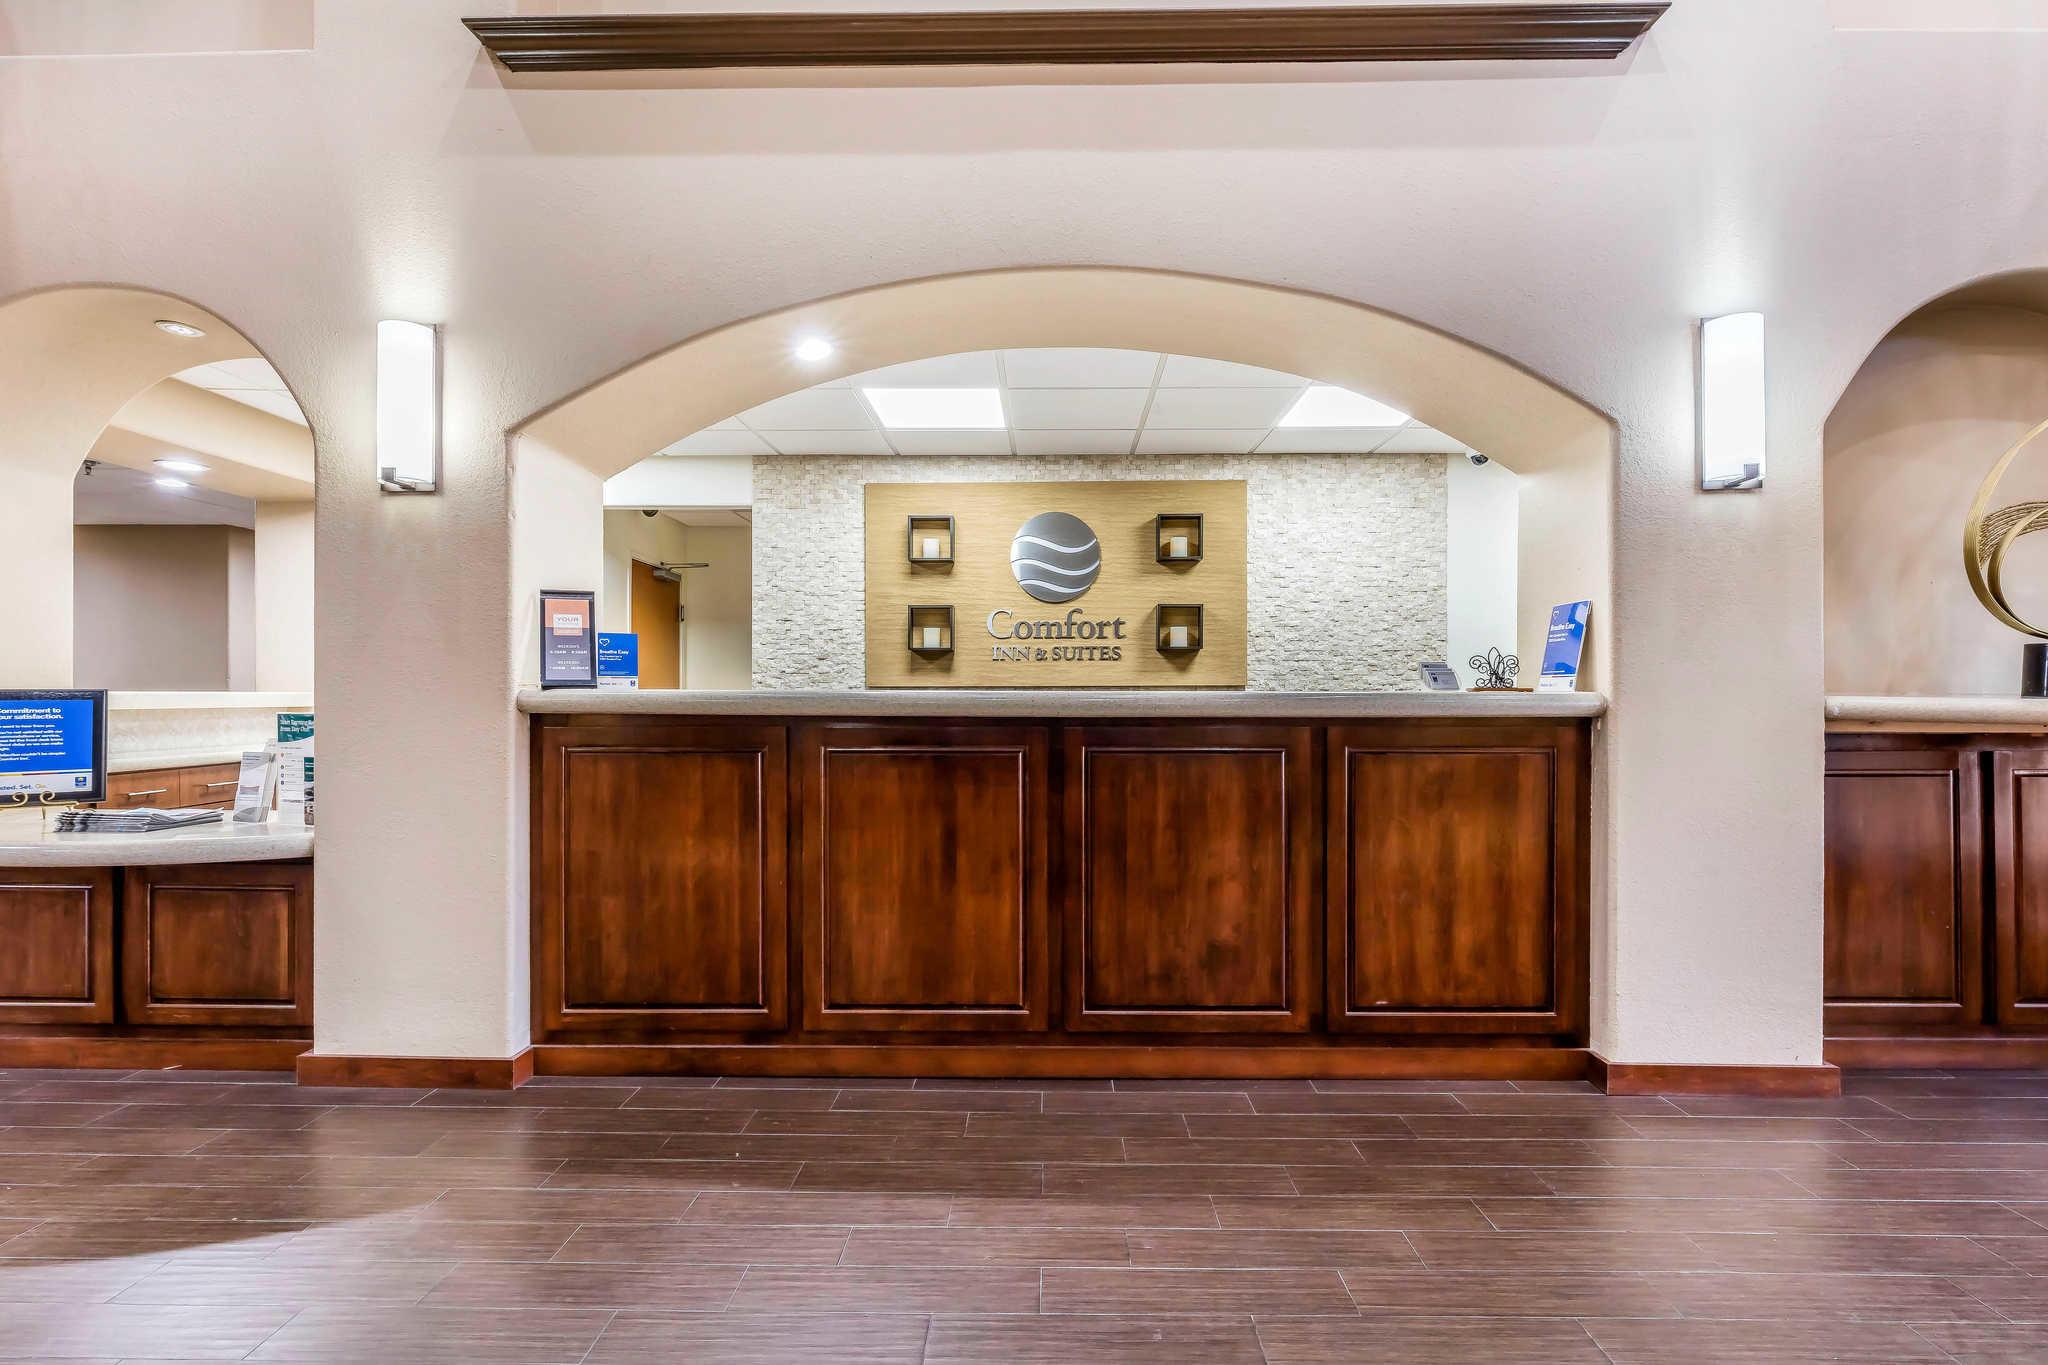 Comfort Inn & Suites Airport-American Way image 3